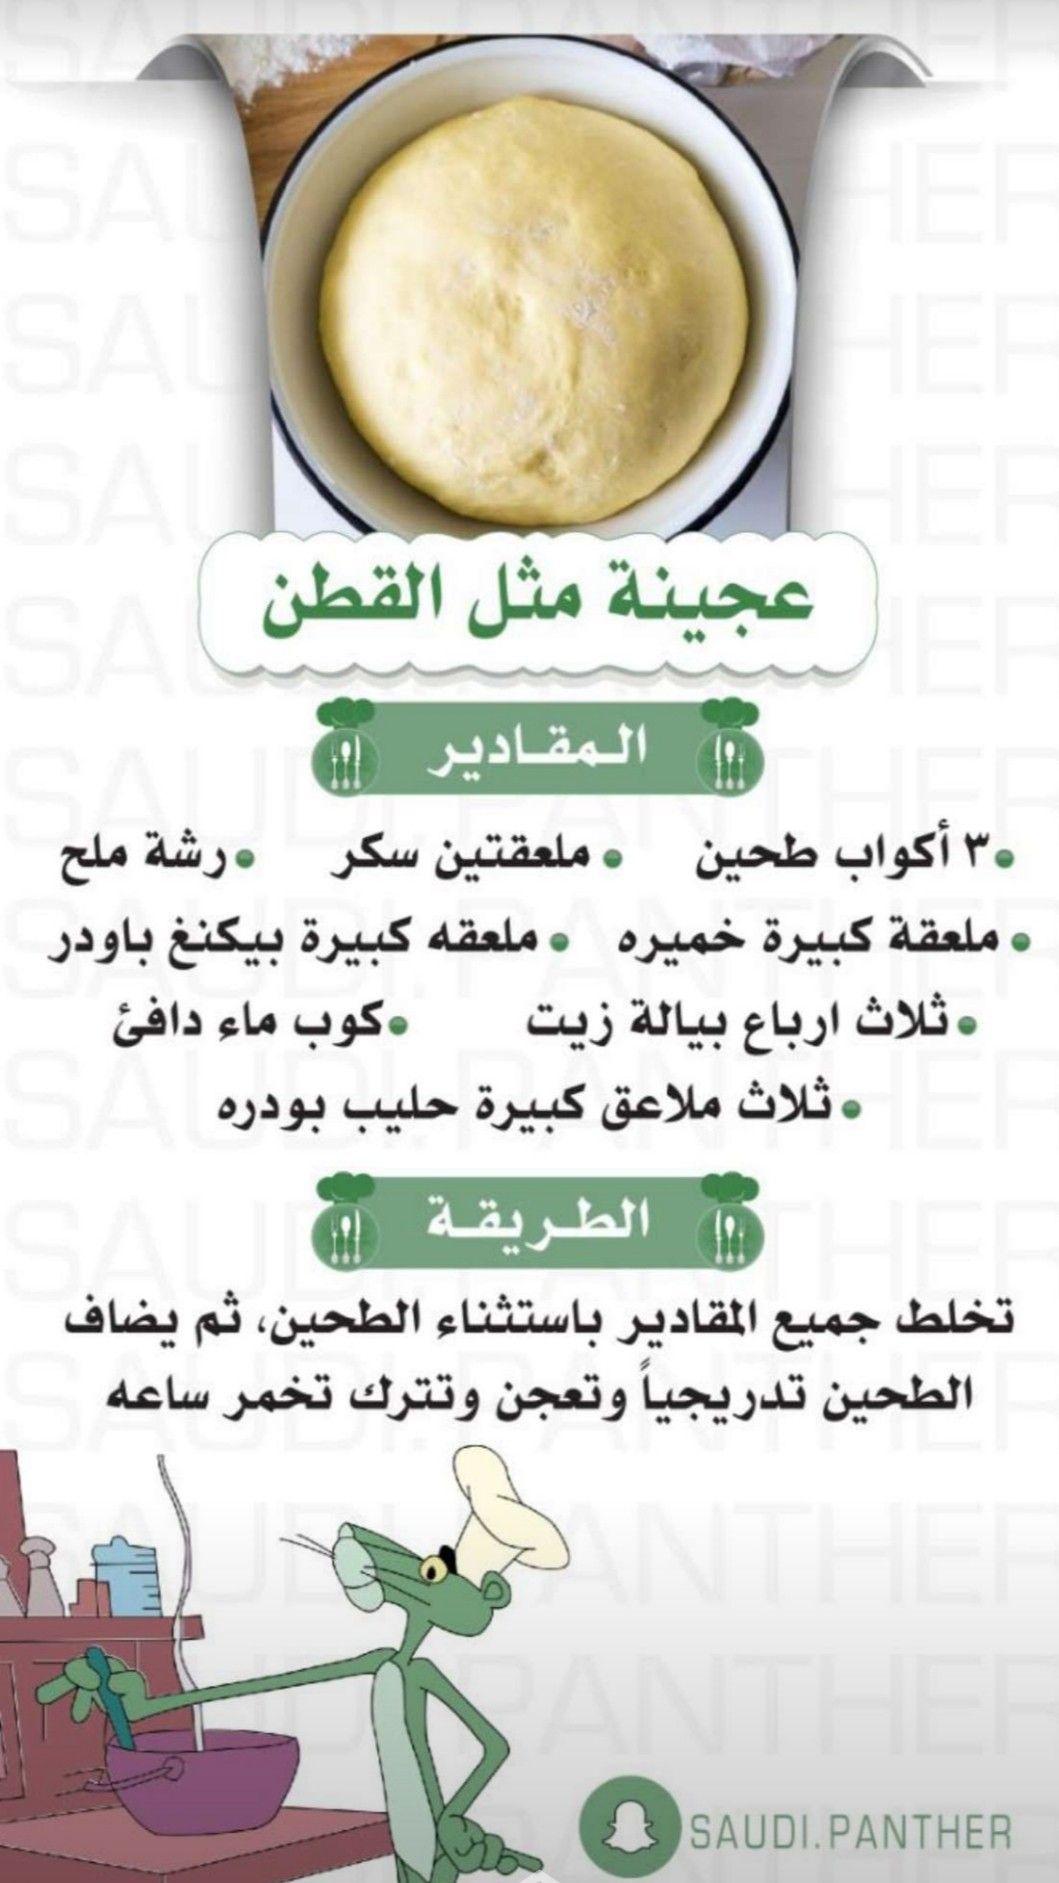 Pin By Mehaf Assiri On Cooking Diy Food Recipes Food Receipes Save Food